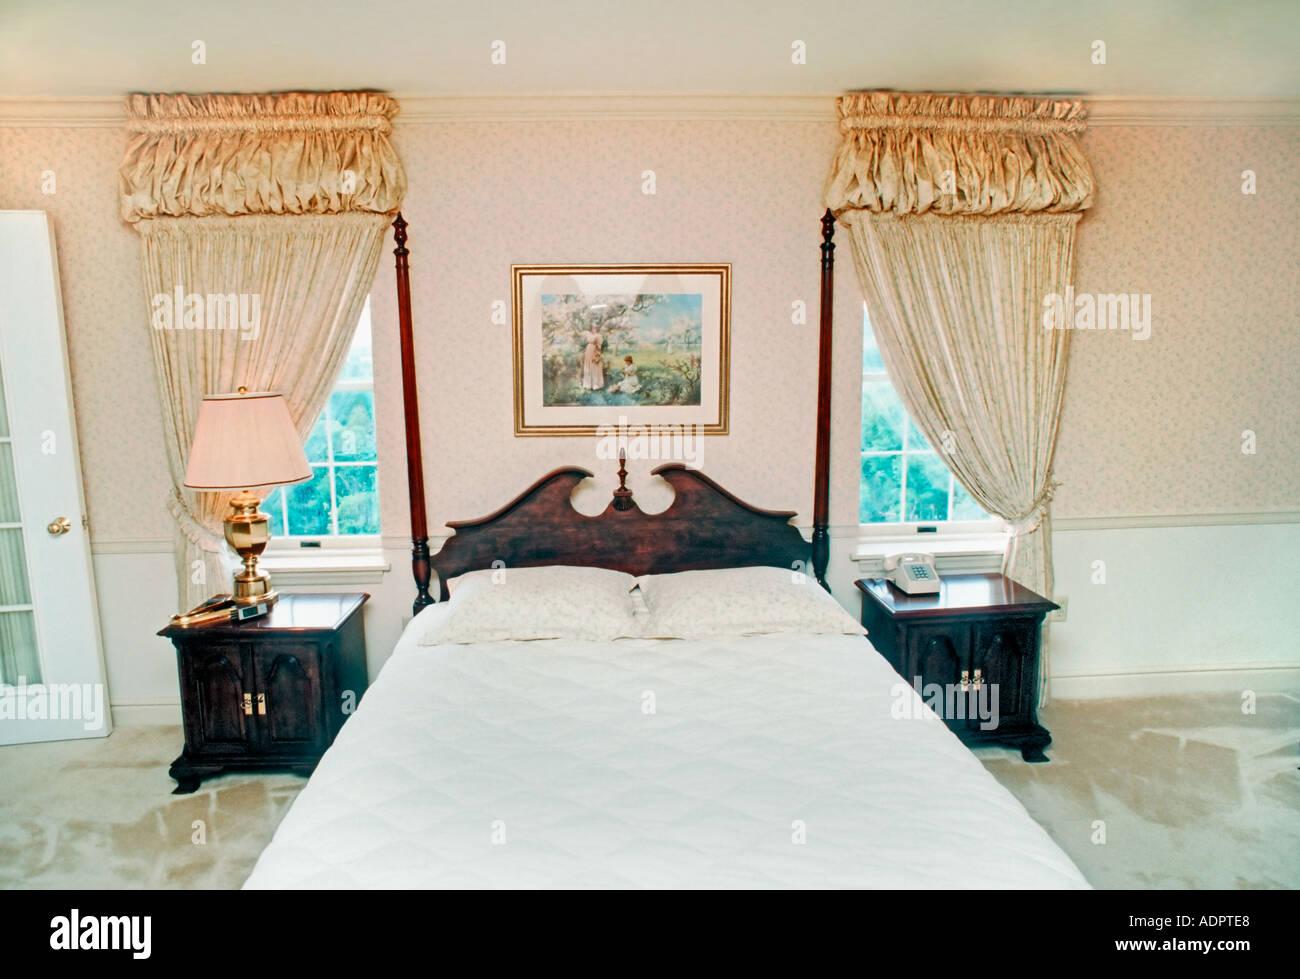 Innenarchitektur Usa pittsburgh pa usa zimmer luxuriöses interieur showcase home